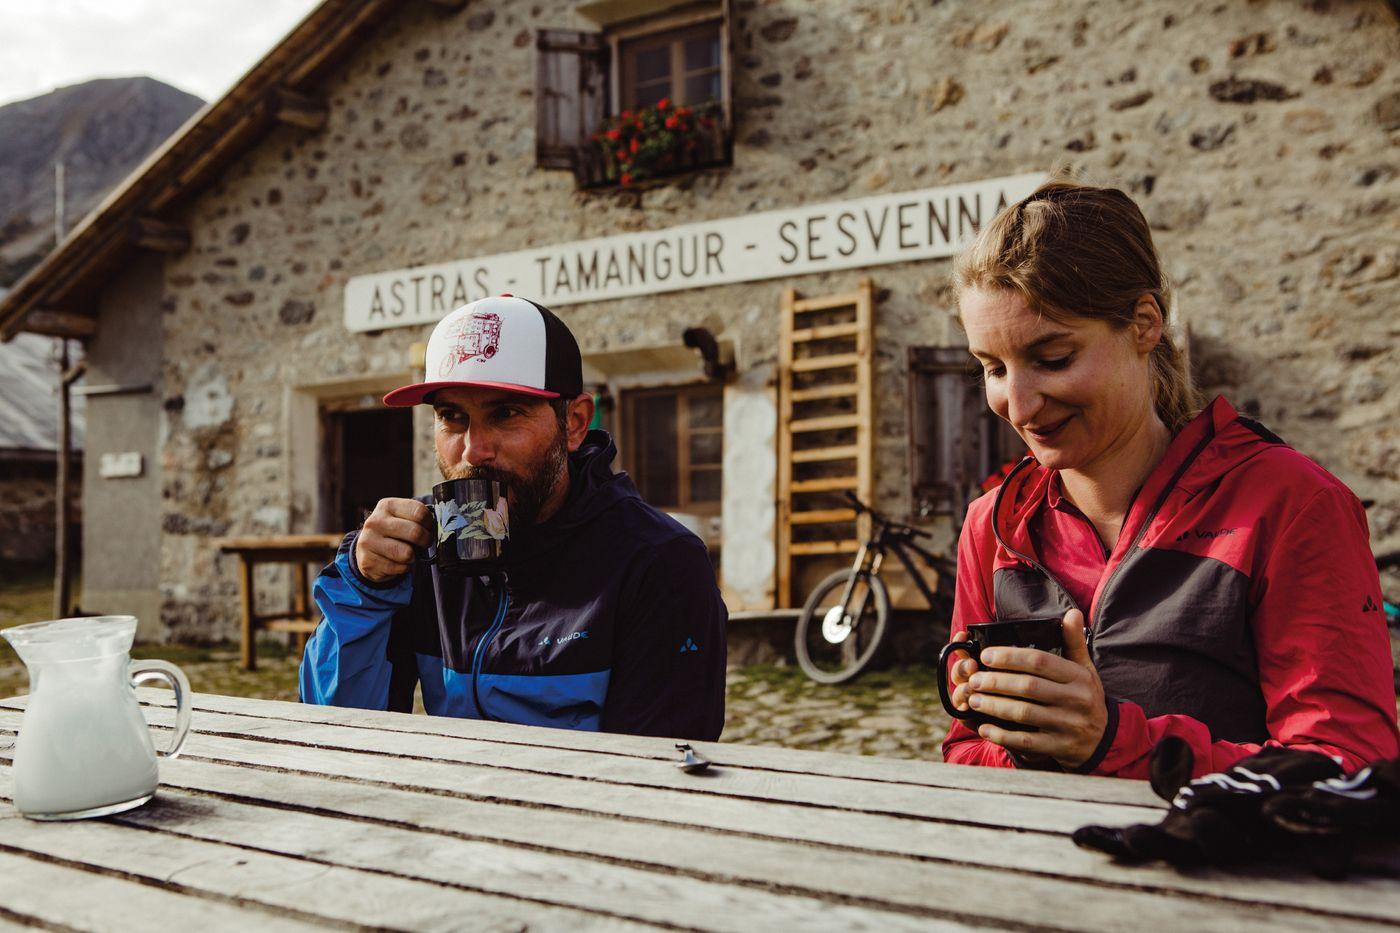 Crappa Prada God -  Cappuccino auf der Alp Astras Tamangur